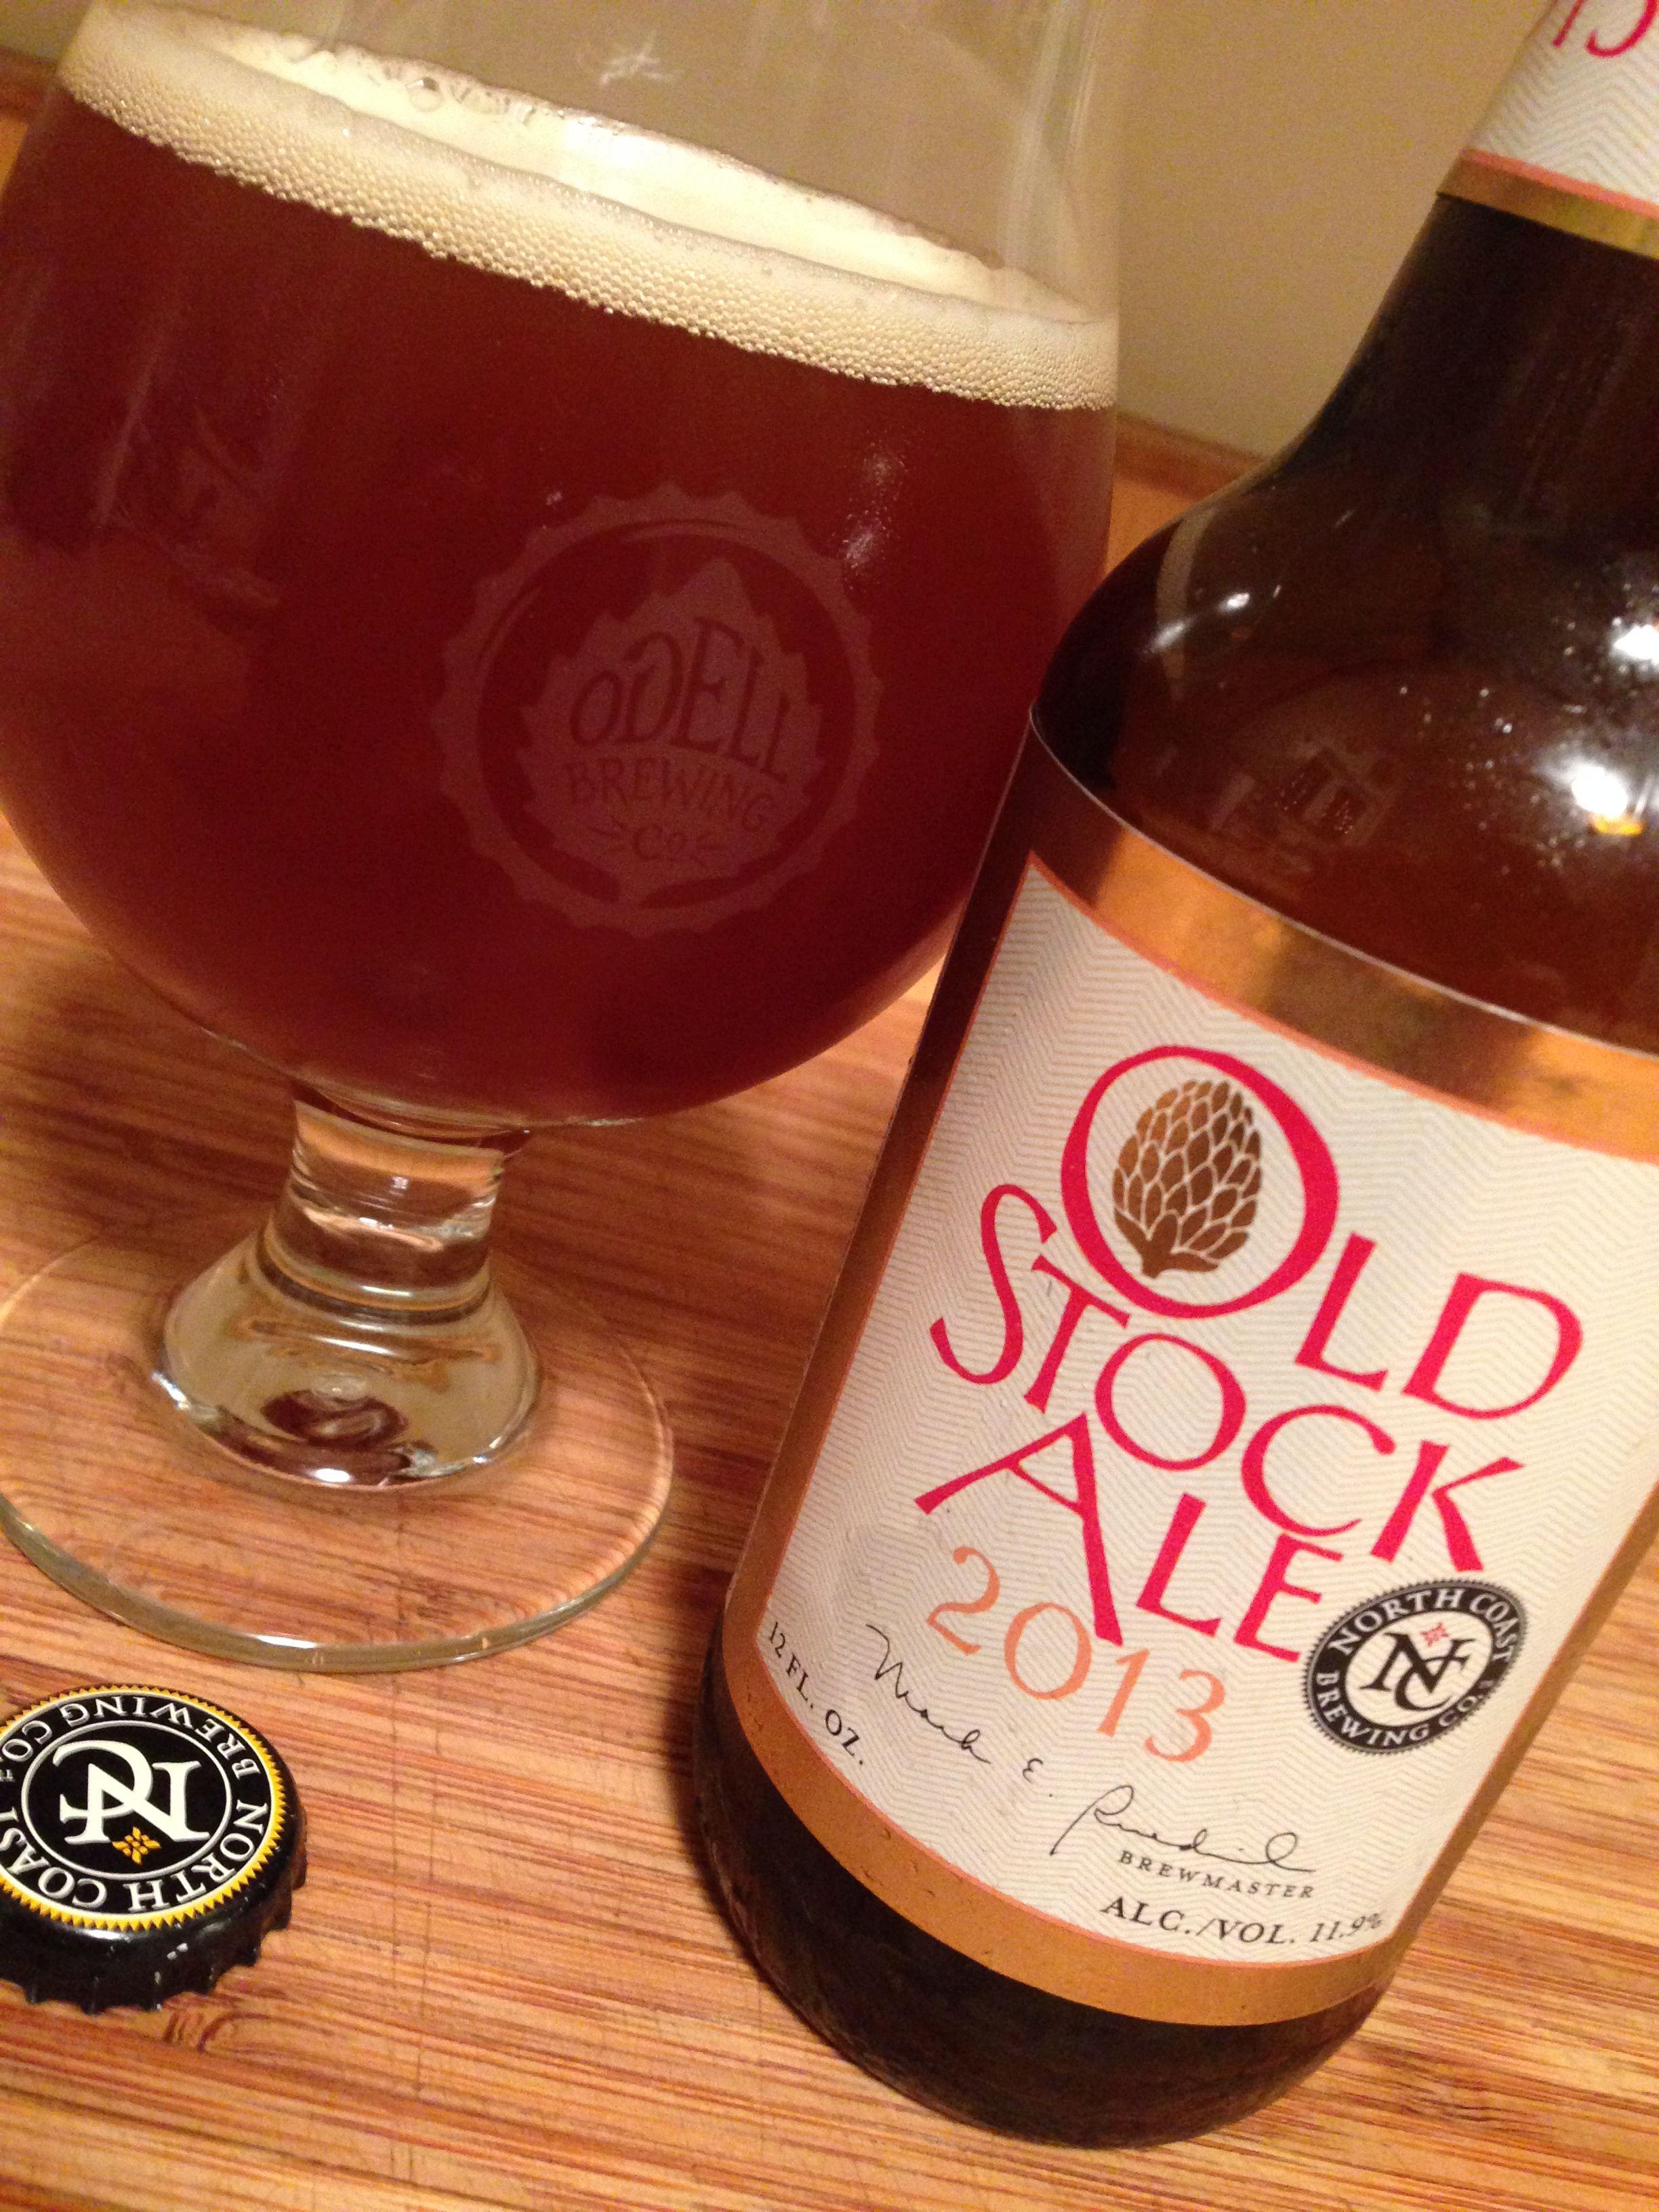 Beer Of The Month Club Microbrewed Beer Clubs Since 1994 Beer Club Wine And Beer Craft Beer